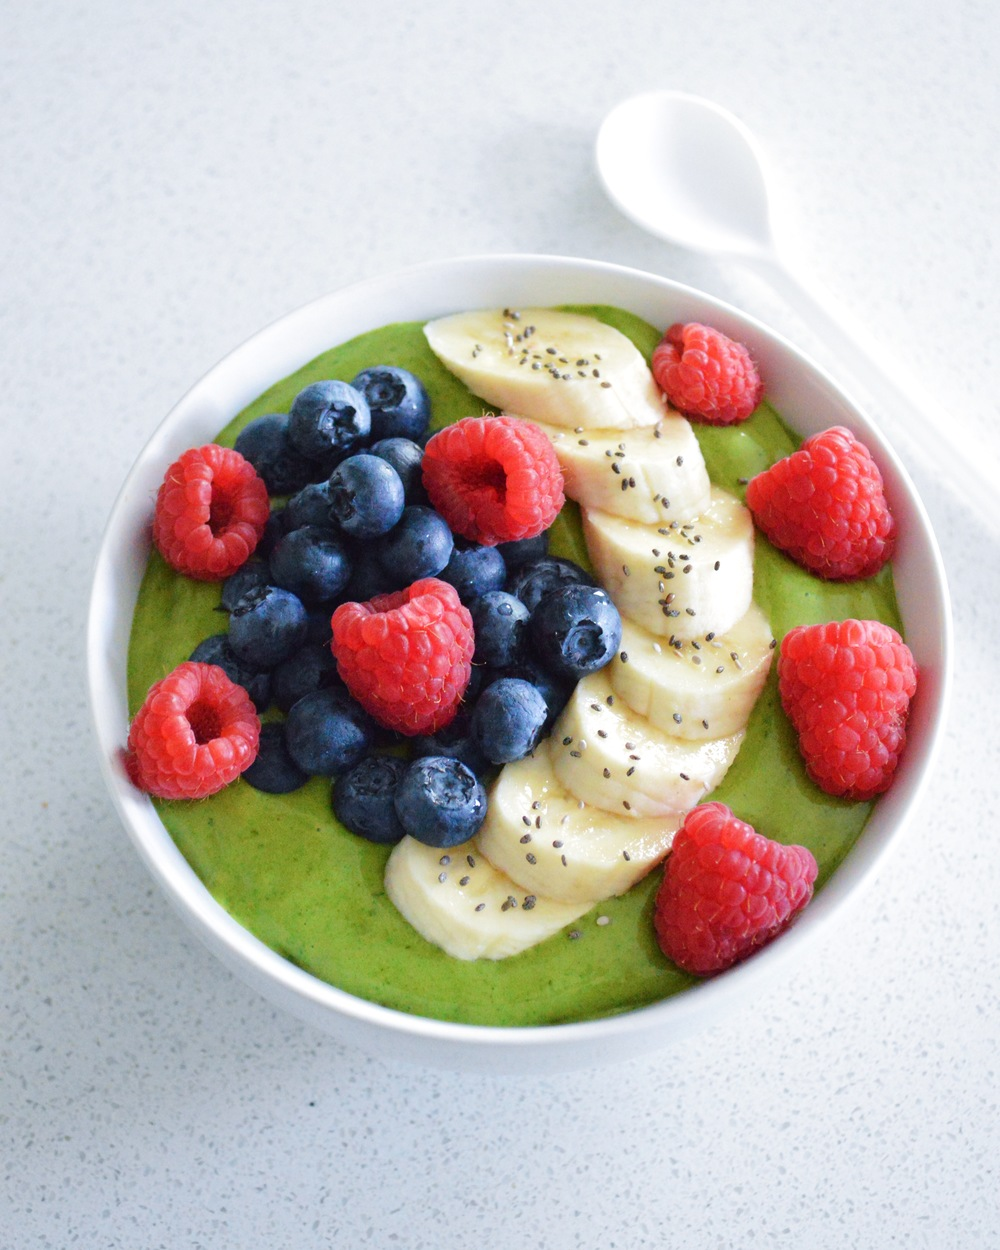 Avocado-Smoothie-Bowl-LaurenSchwaiger-Life-Style-Blog.jpg